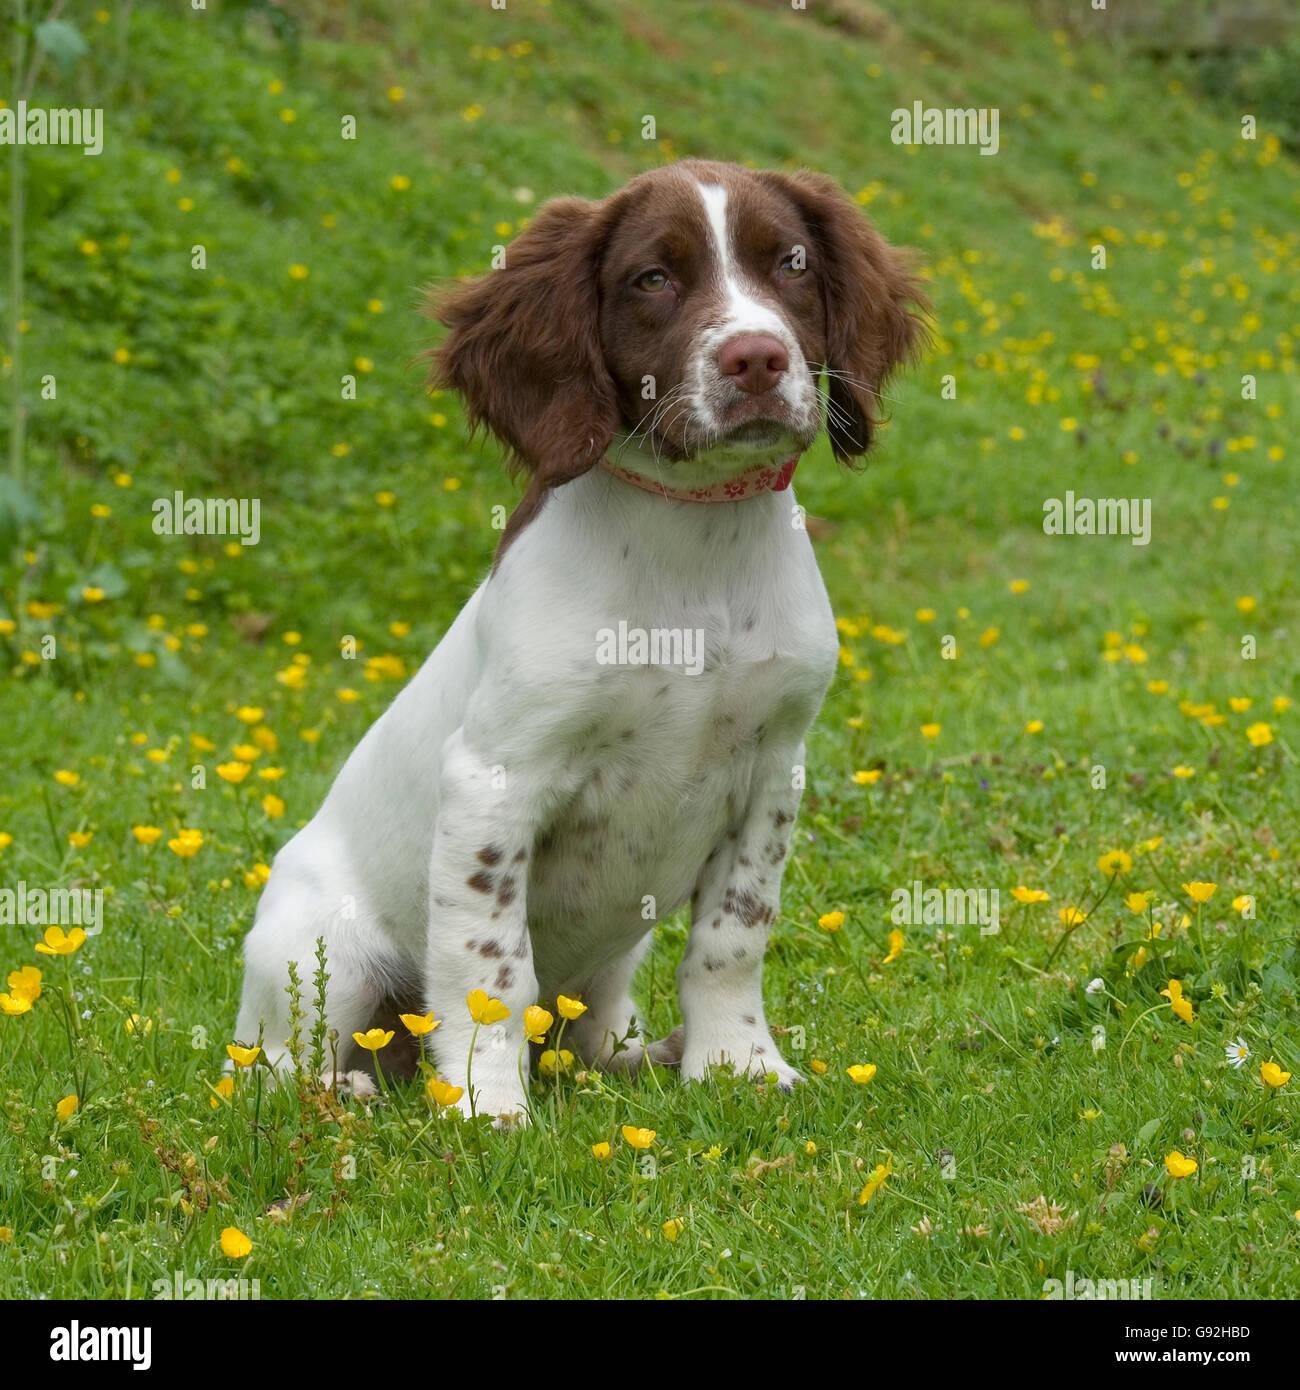 english springer spaniel puppy - Stock Image